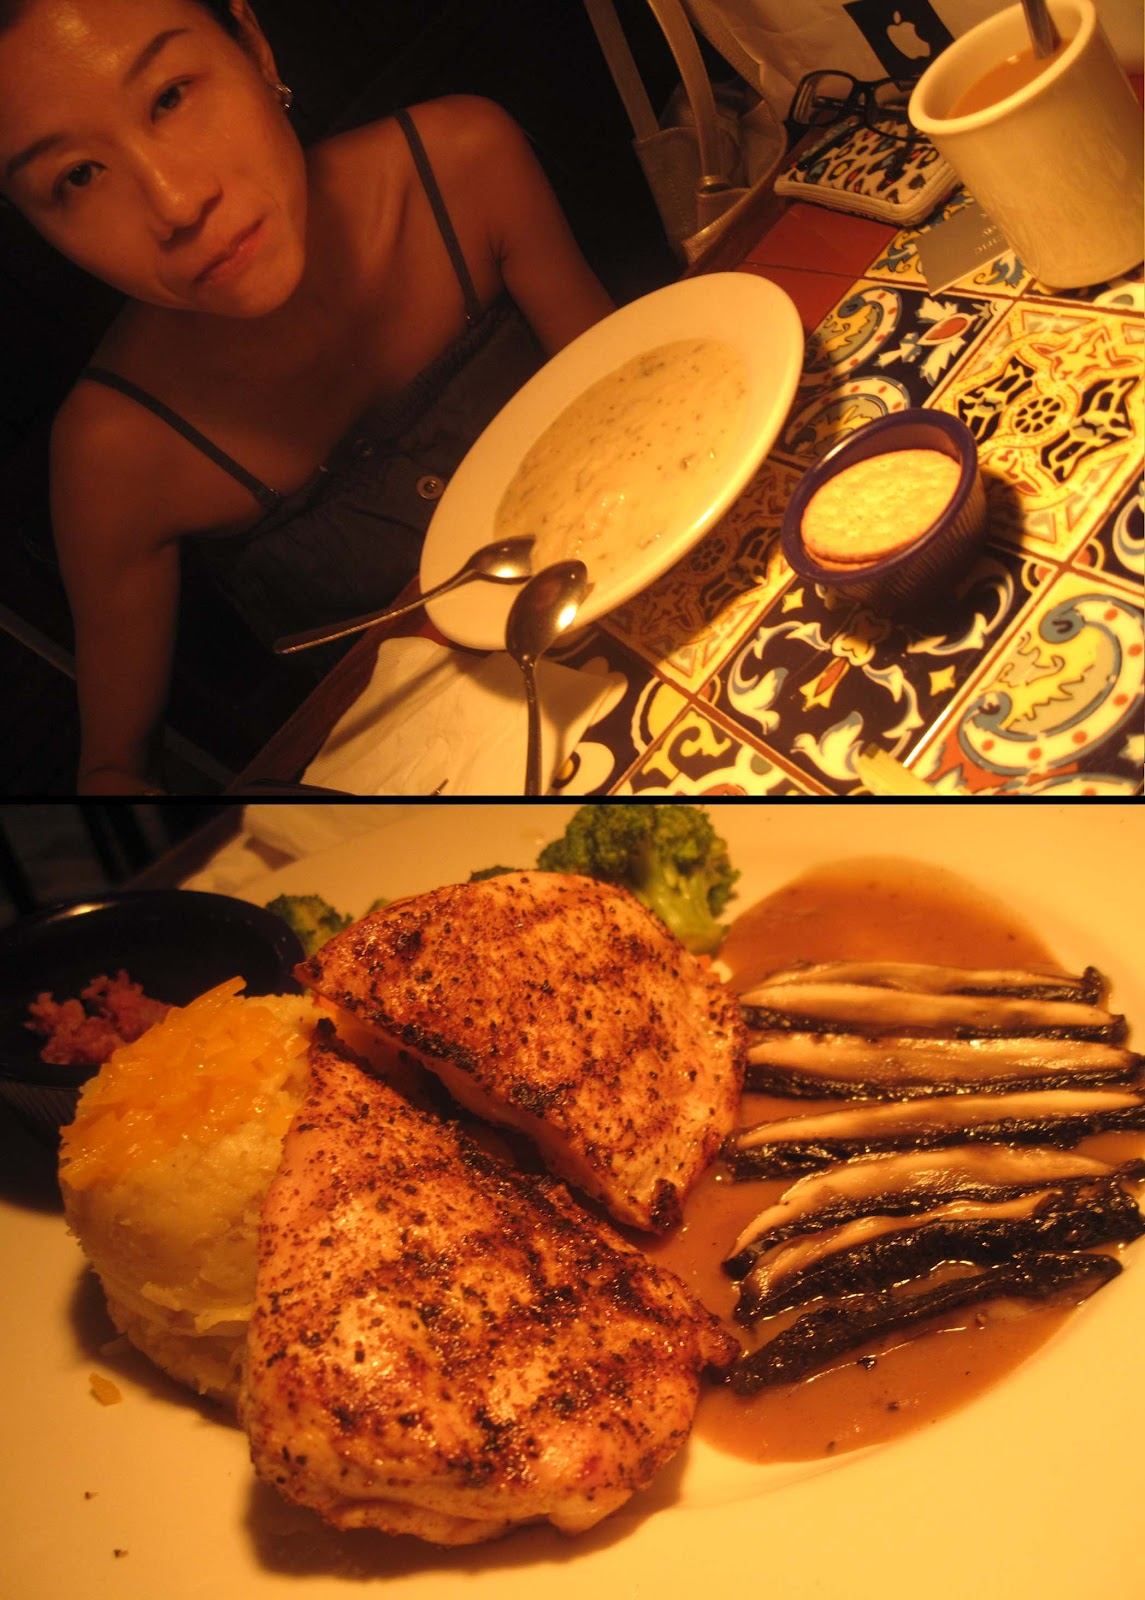 http://4.bp.blogspot.com/-H1TiYu0mlSI/UCHZ0C7oKpI/AAAAAAAAJ44/KYCF-IsqcMM/s1600/live+v+kon1752+steak.jpg